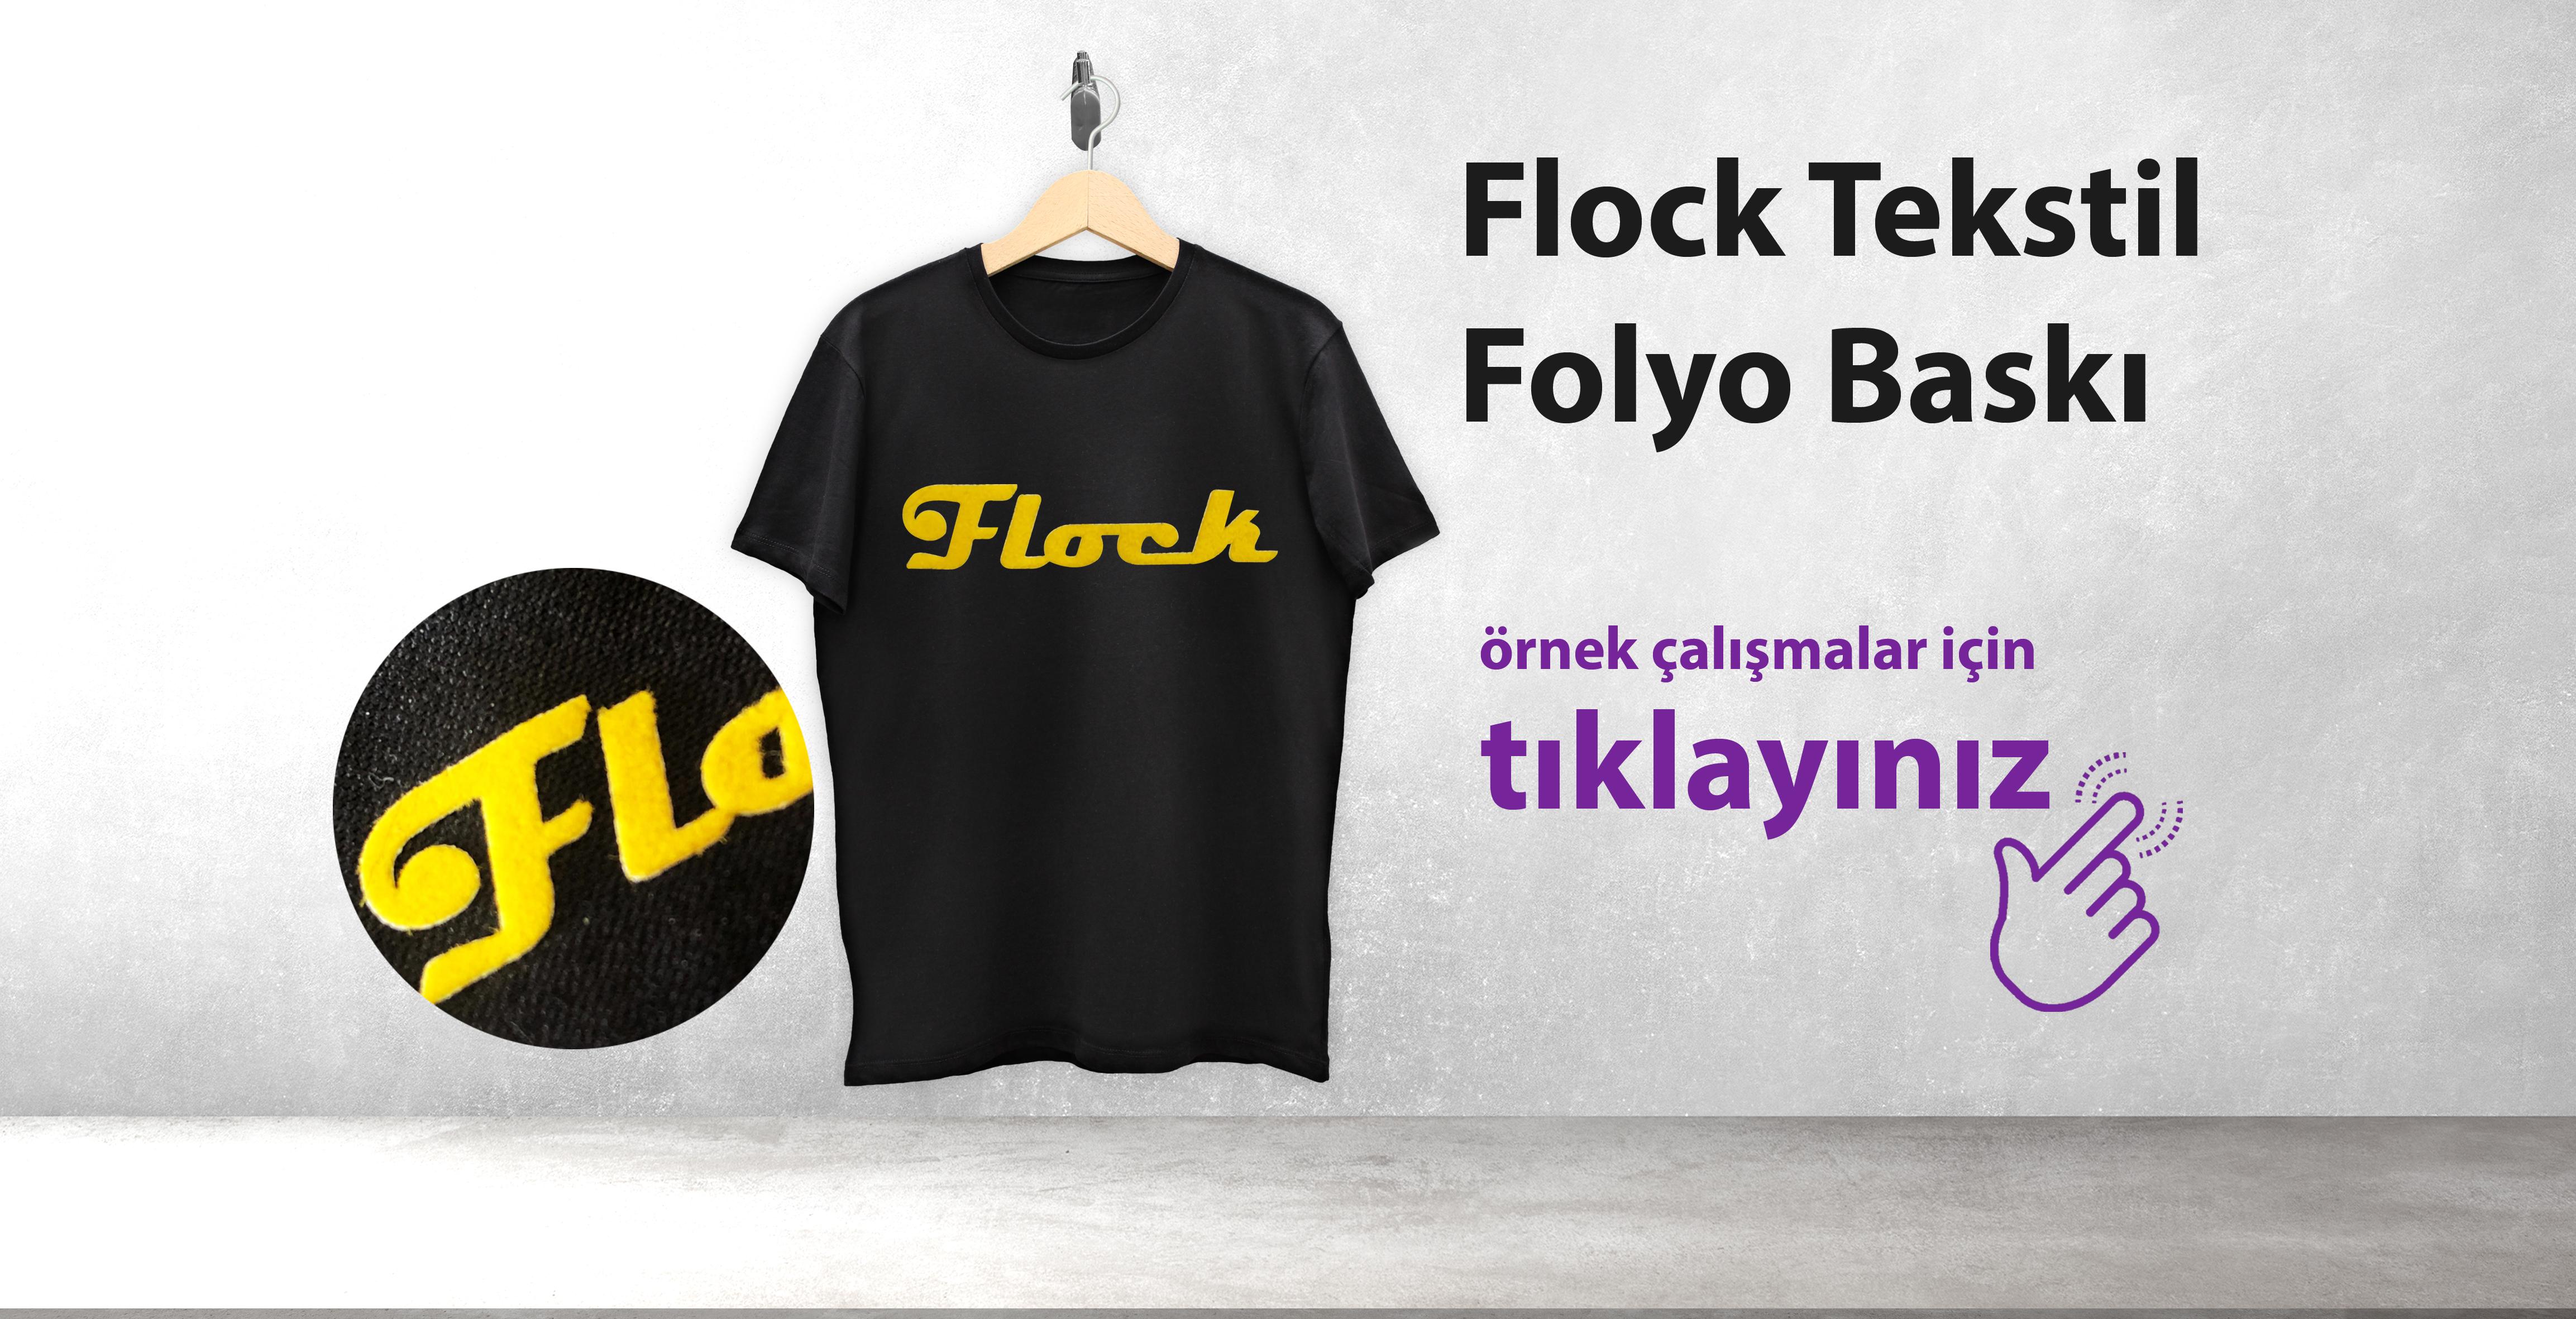 Flock Tekstil Folyo Baskı